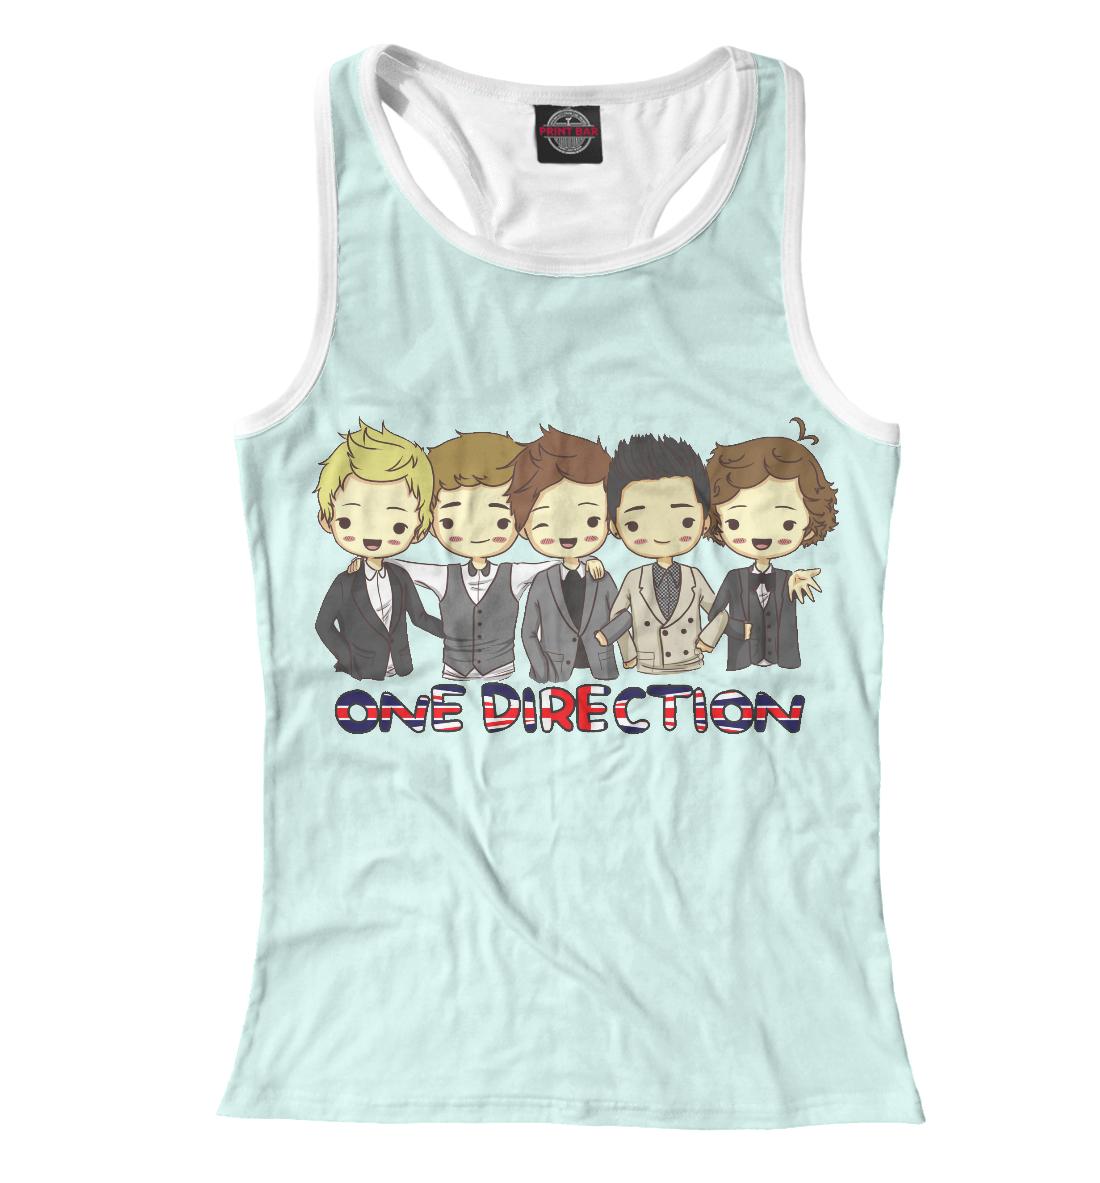 Купить One Direction, Printbar, Майки борцовки, OND-456603-mayb-1